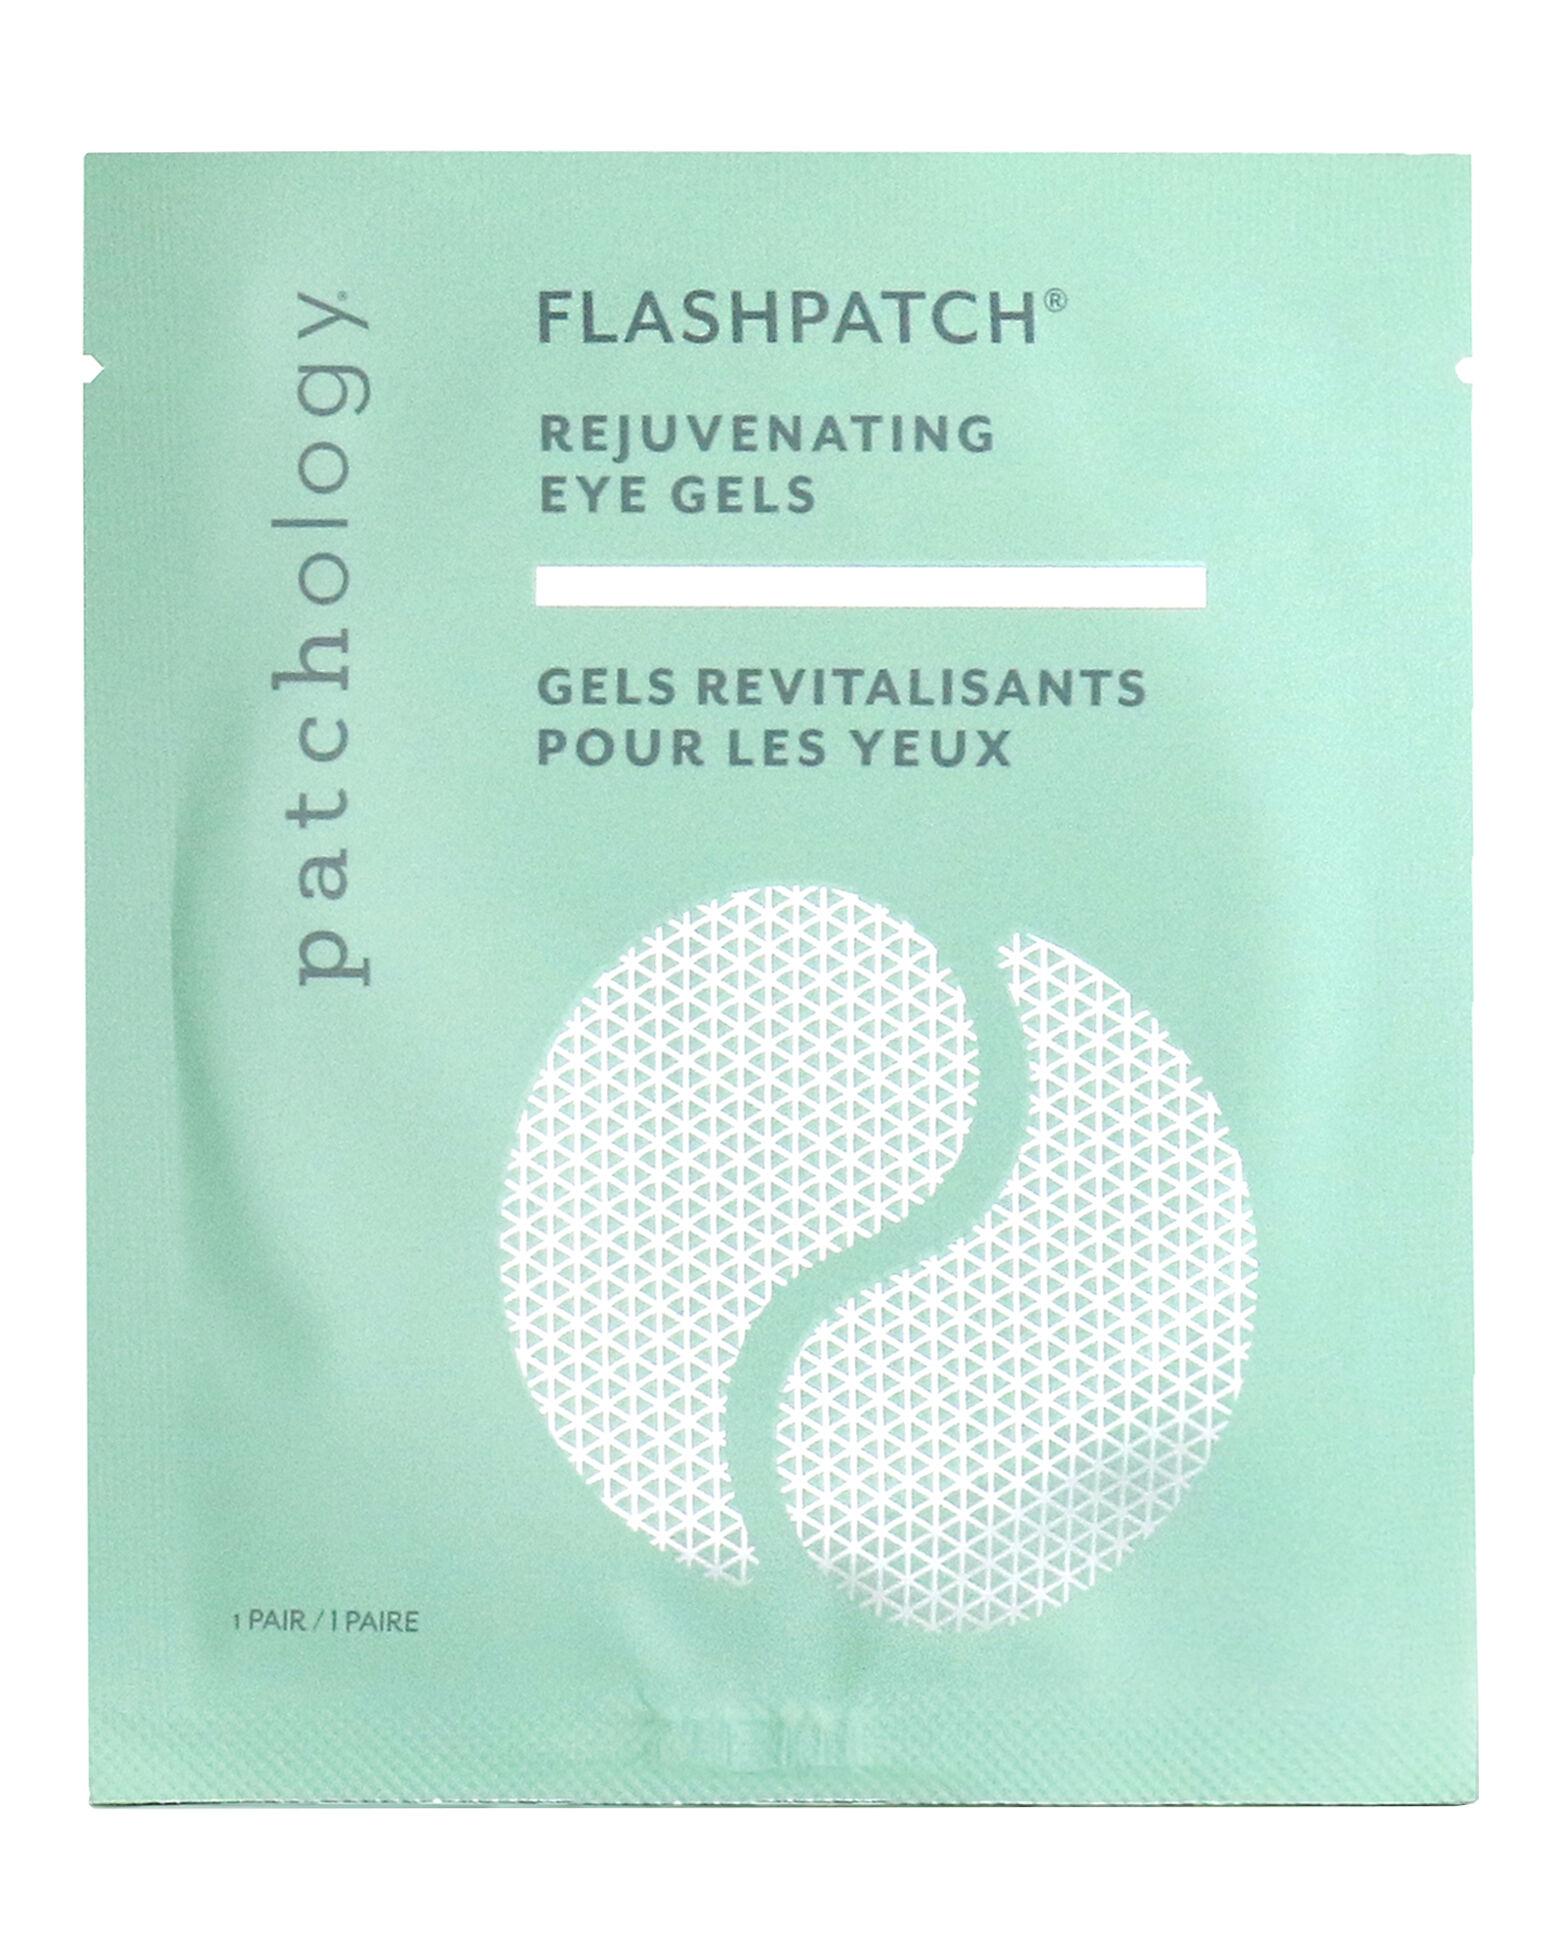 Patchology - FlashPatch Rejuvenating Eye Gels Single